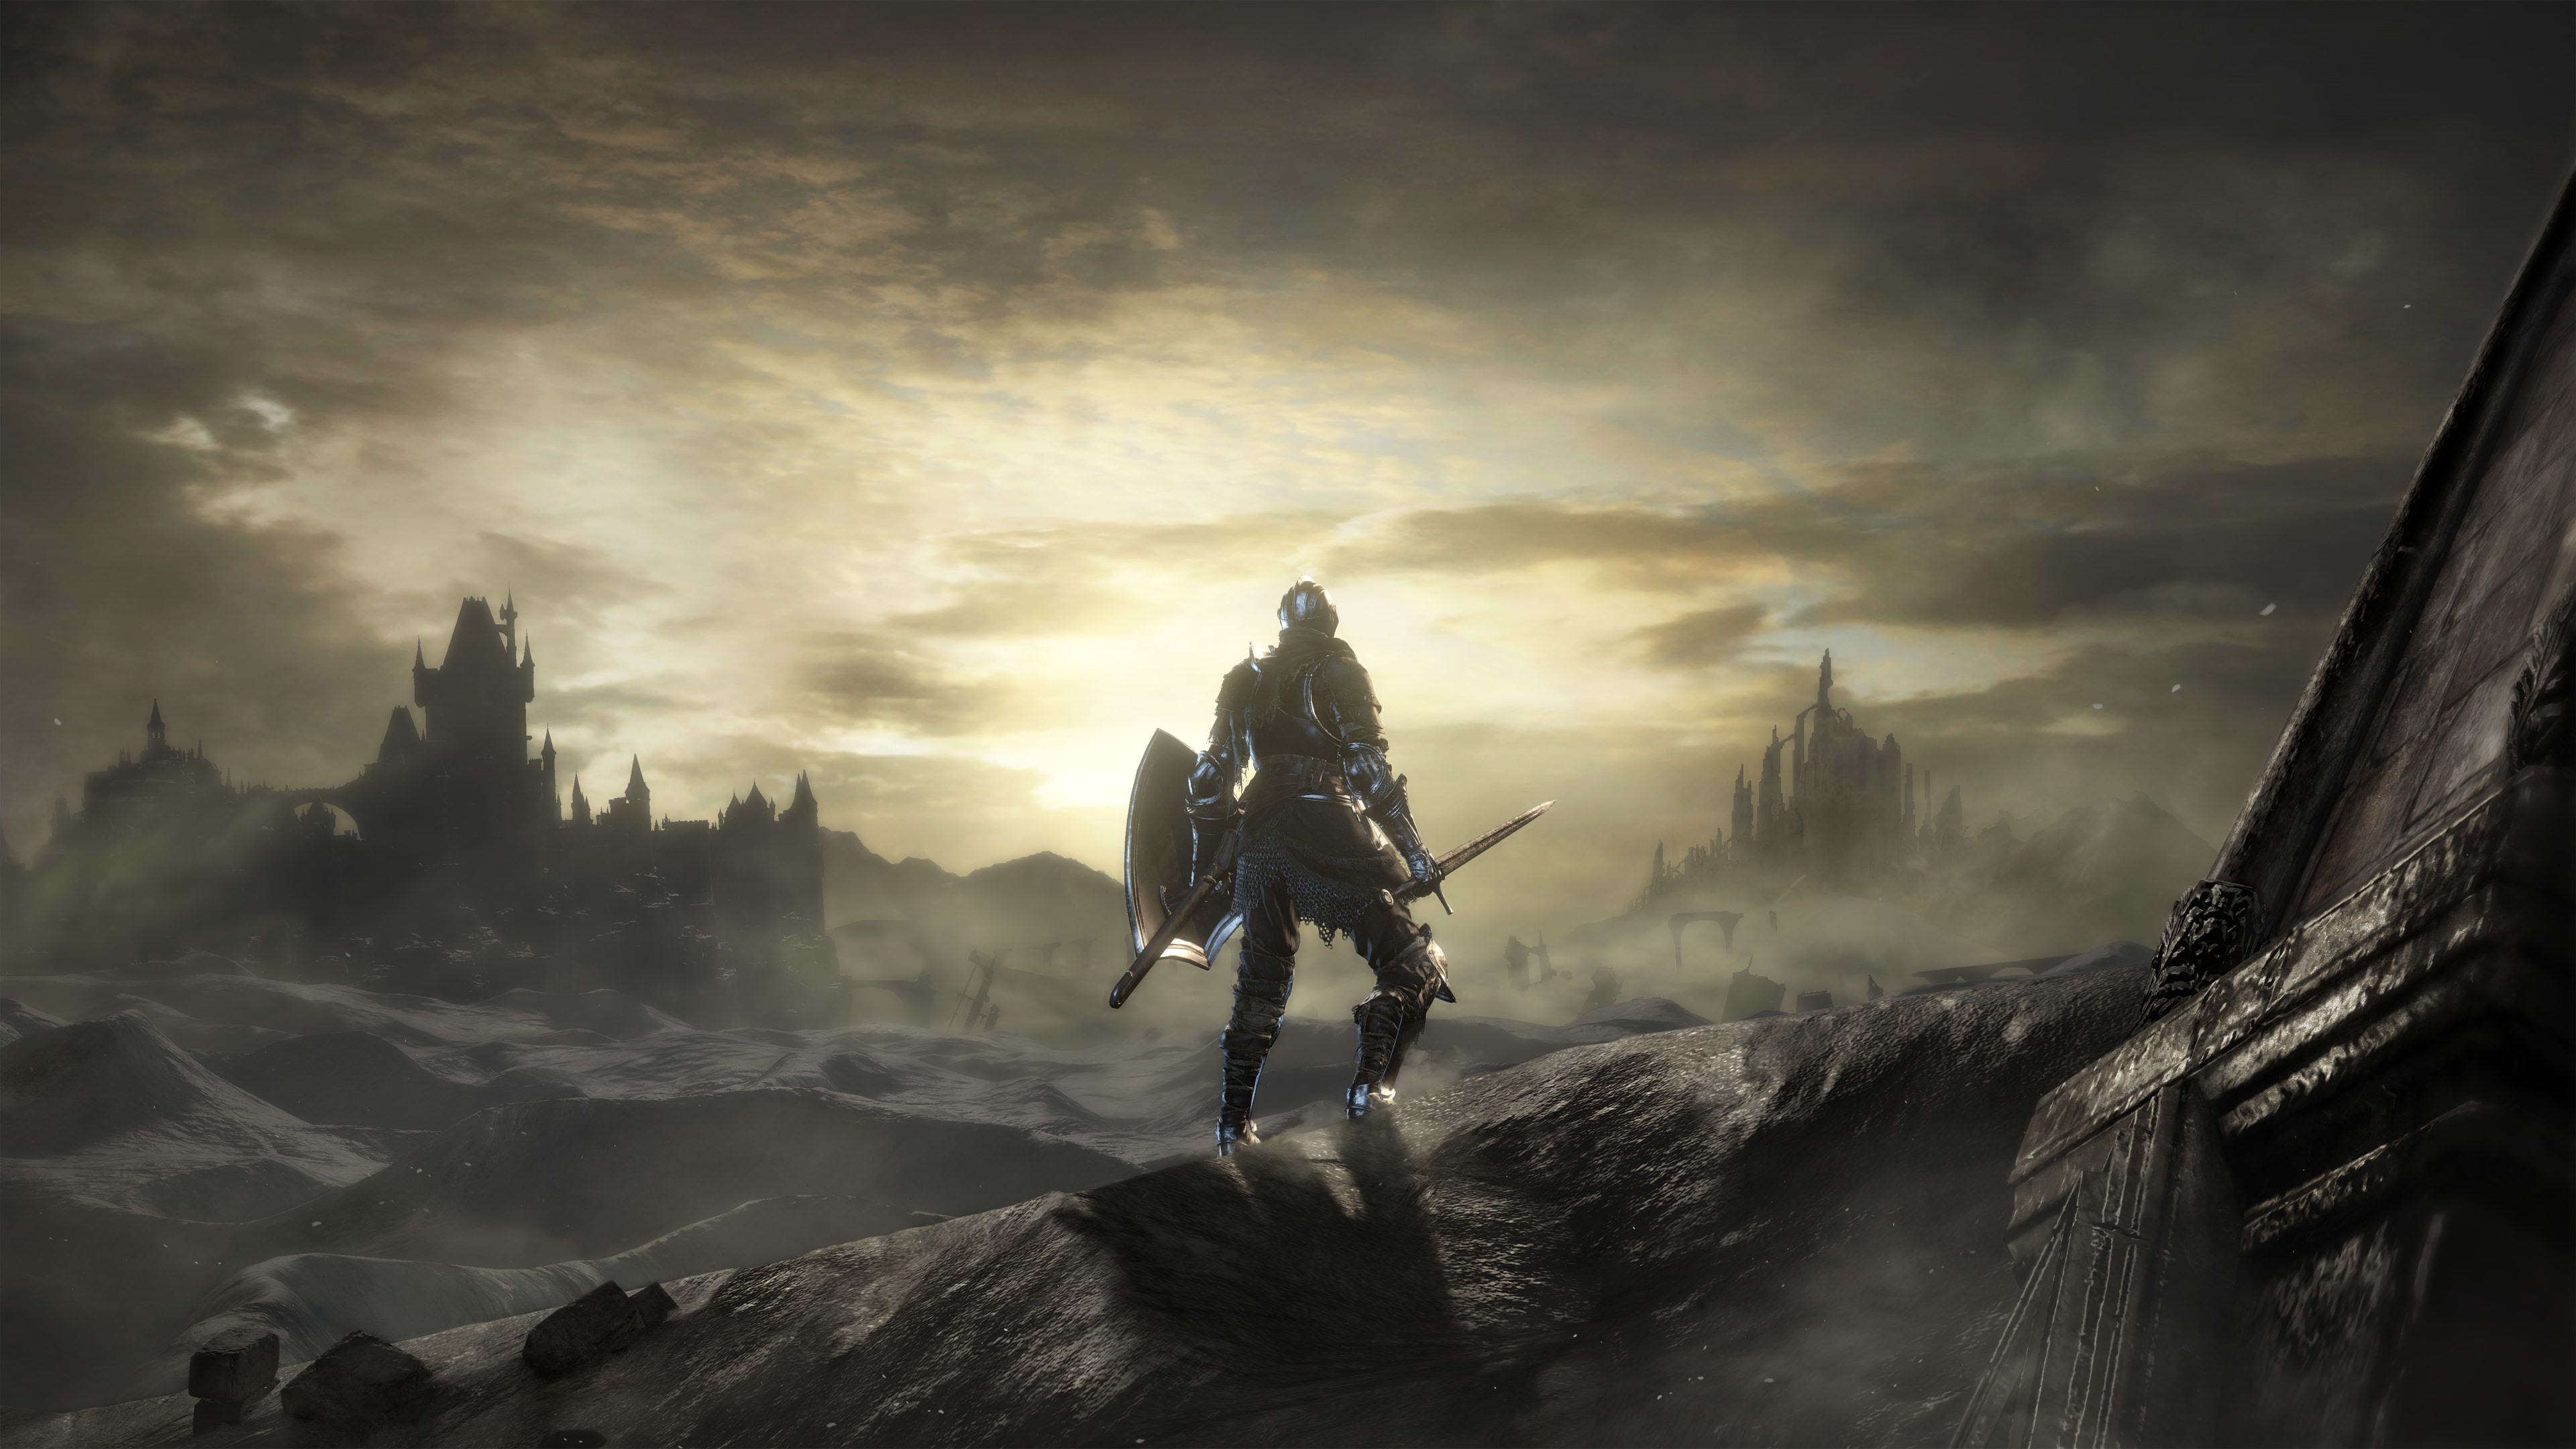 Dark Souls 3 Warrior, HD 4K Wallpaper